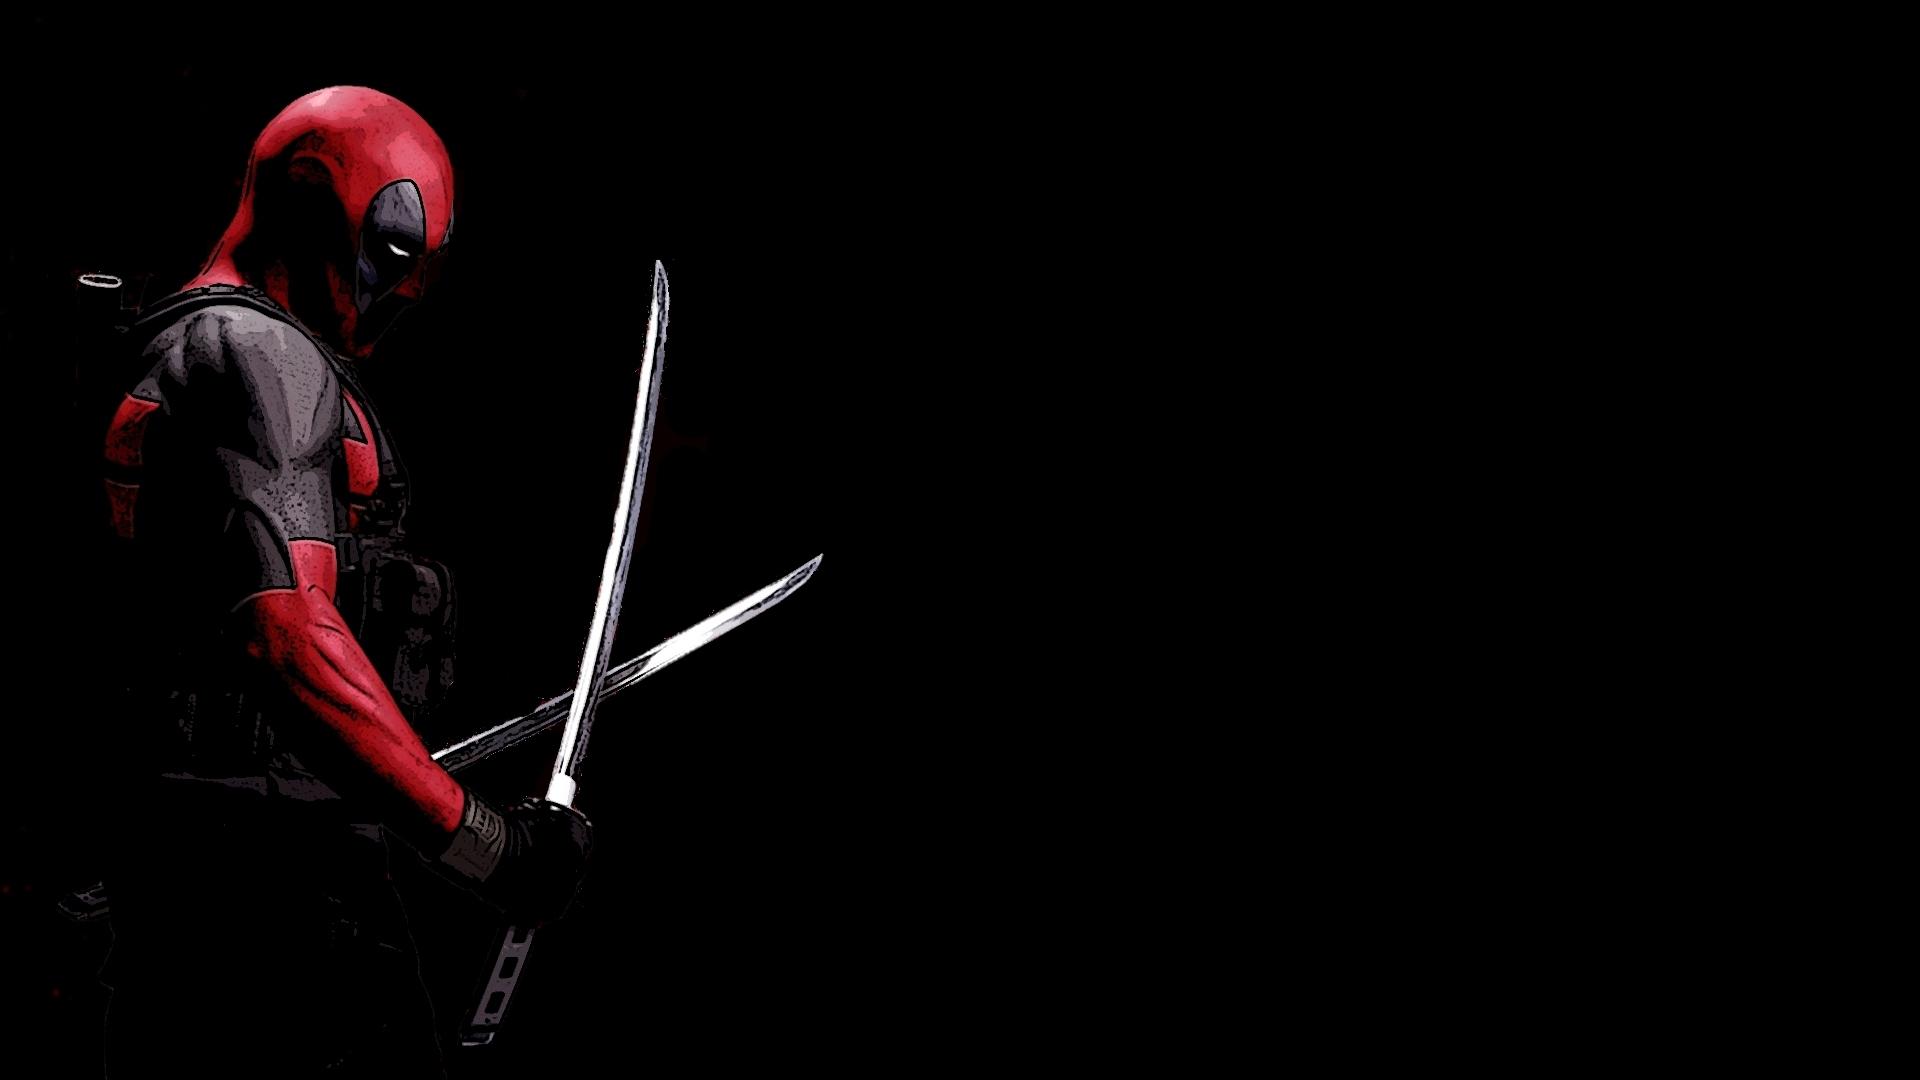 Deadpool 2 Wallpaper Hd   1920x1080   Download HD Wallpaper 1920x1080